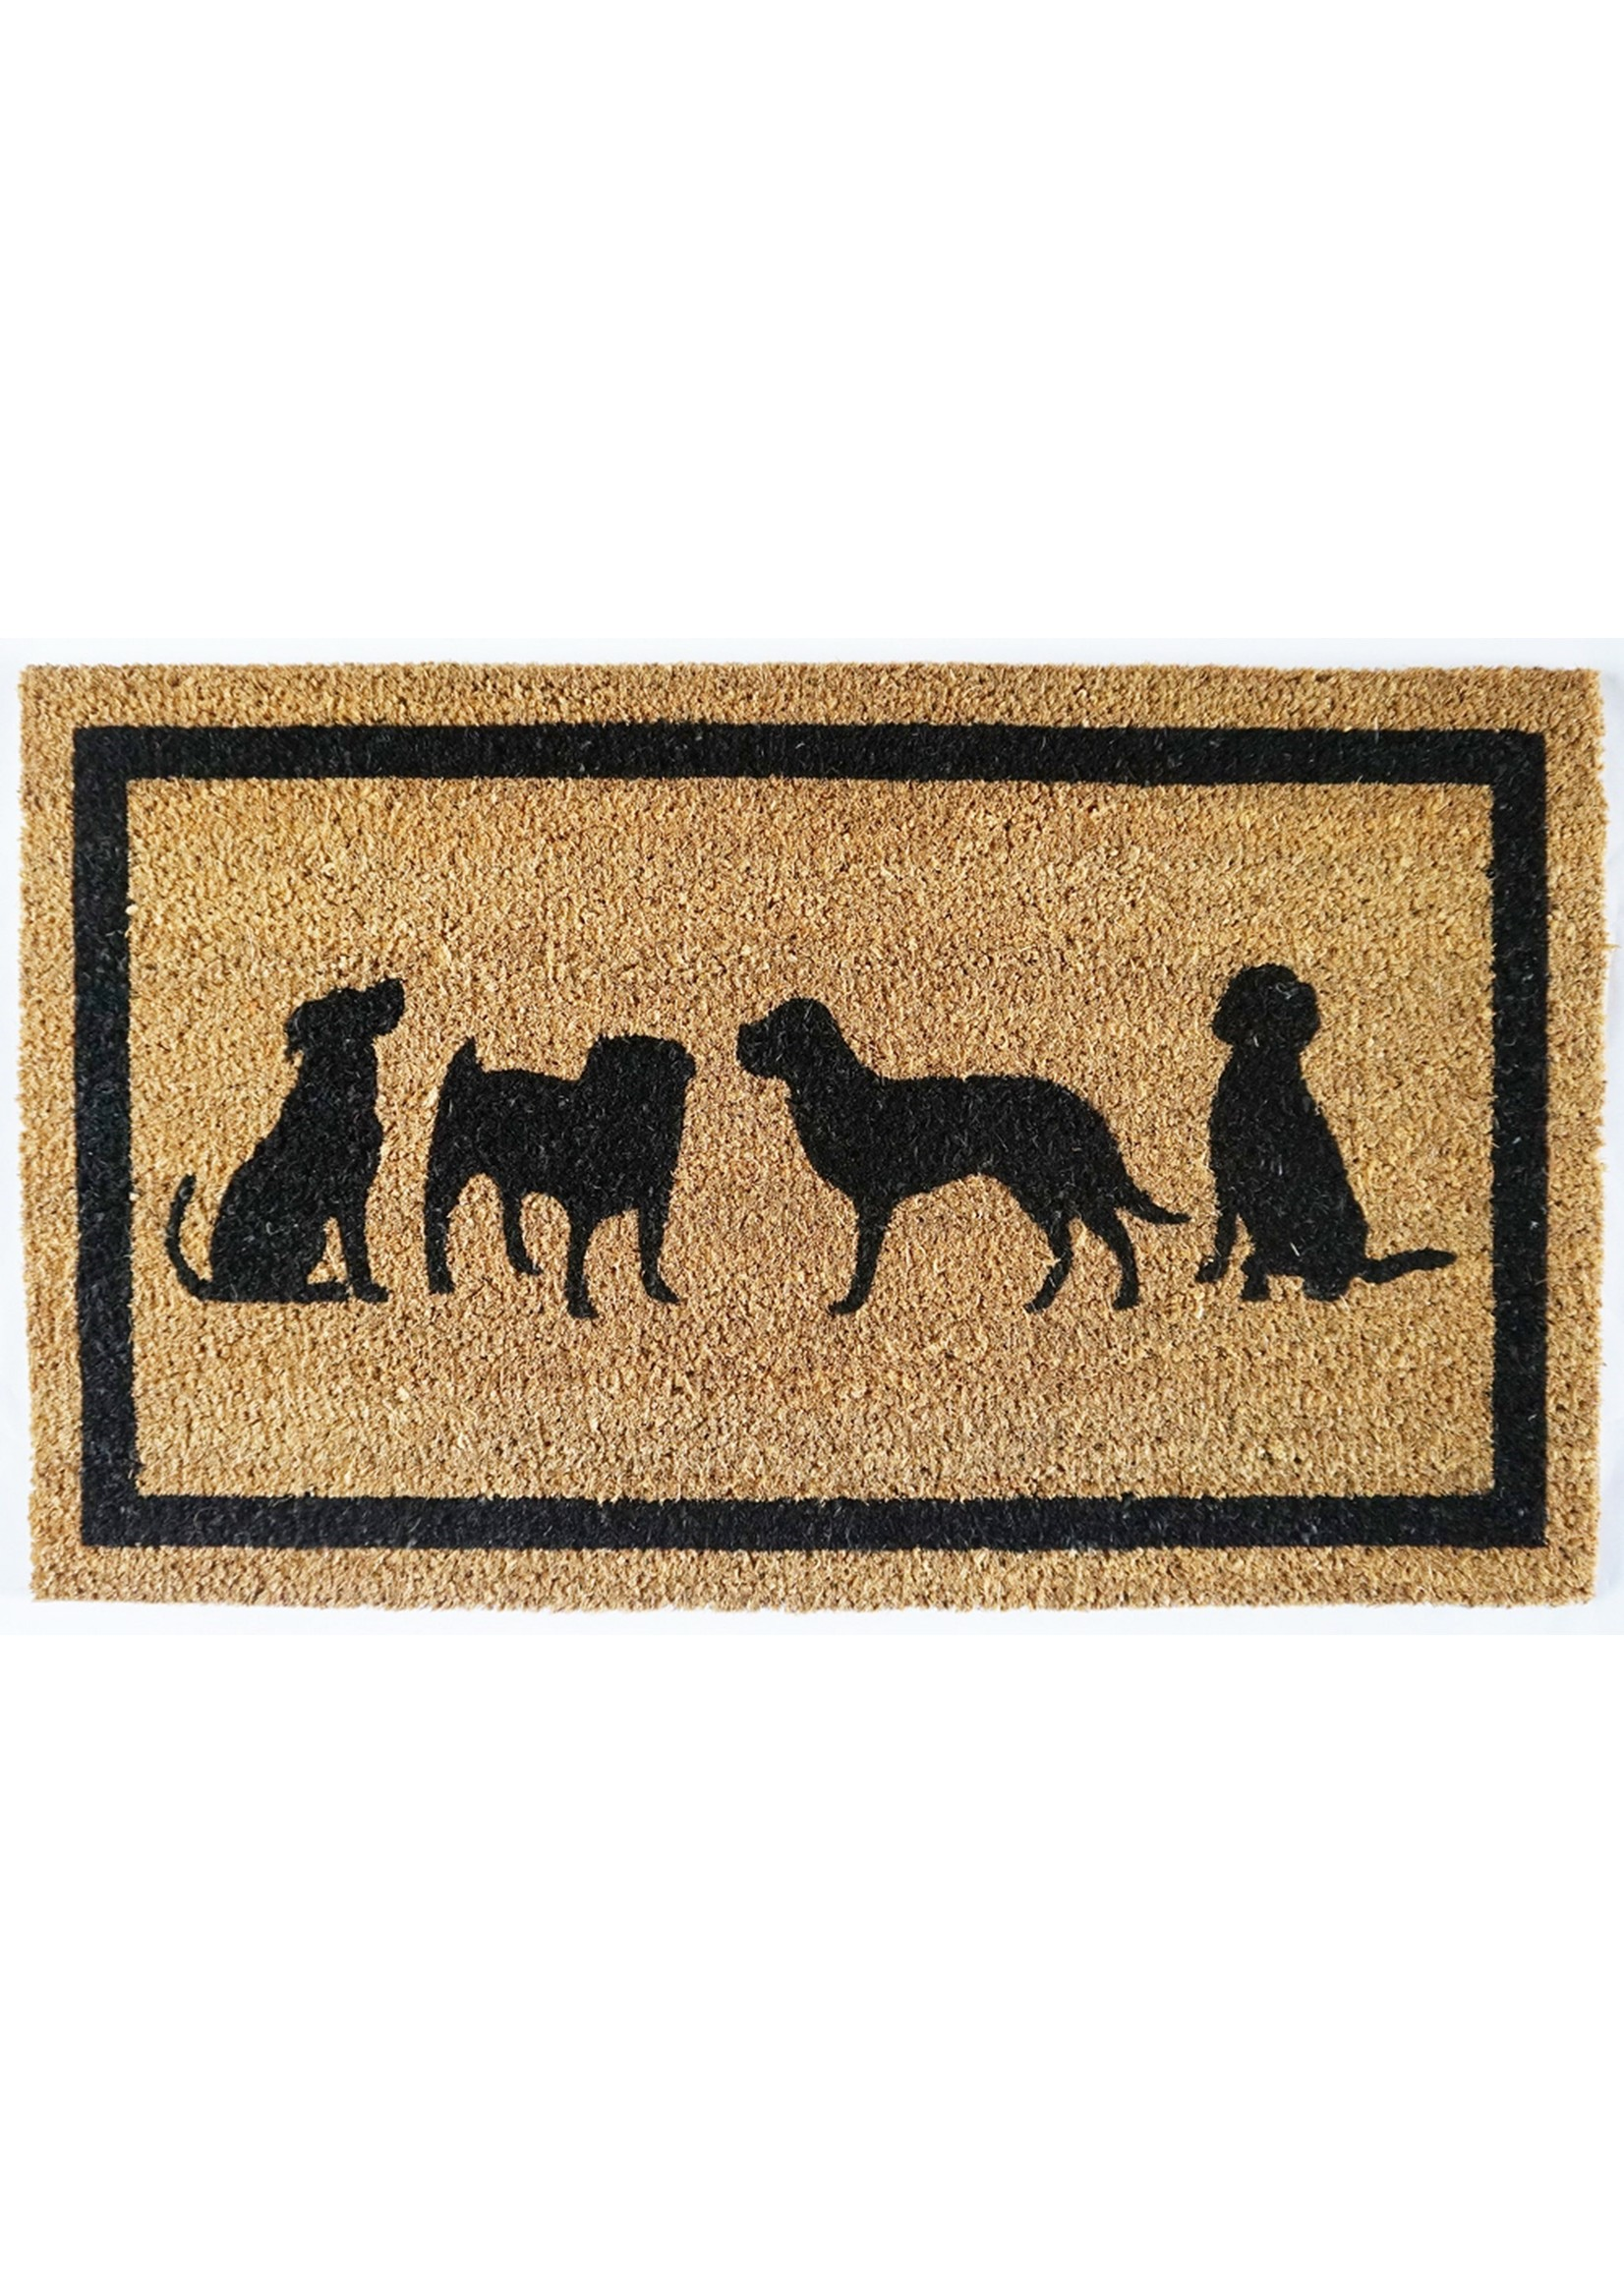 Natural Dog Doormat